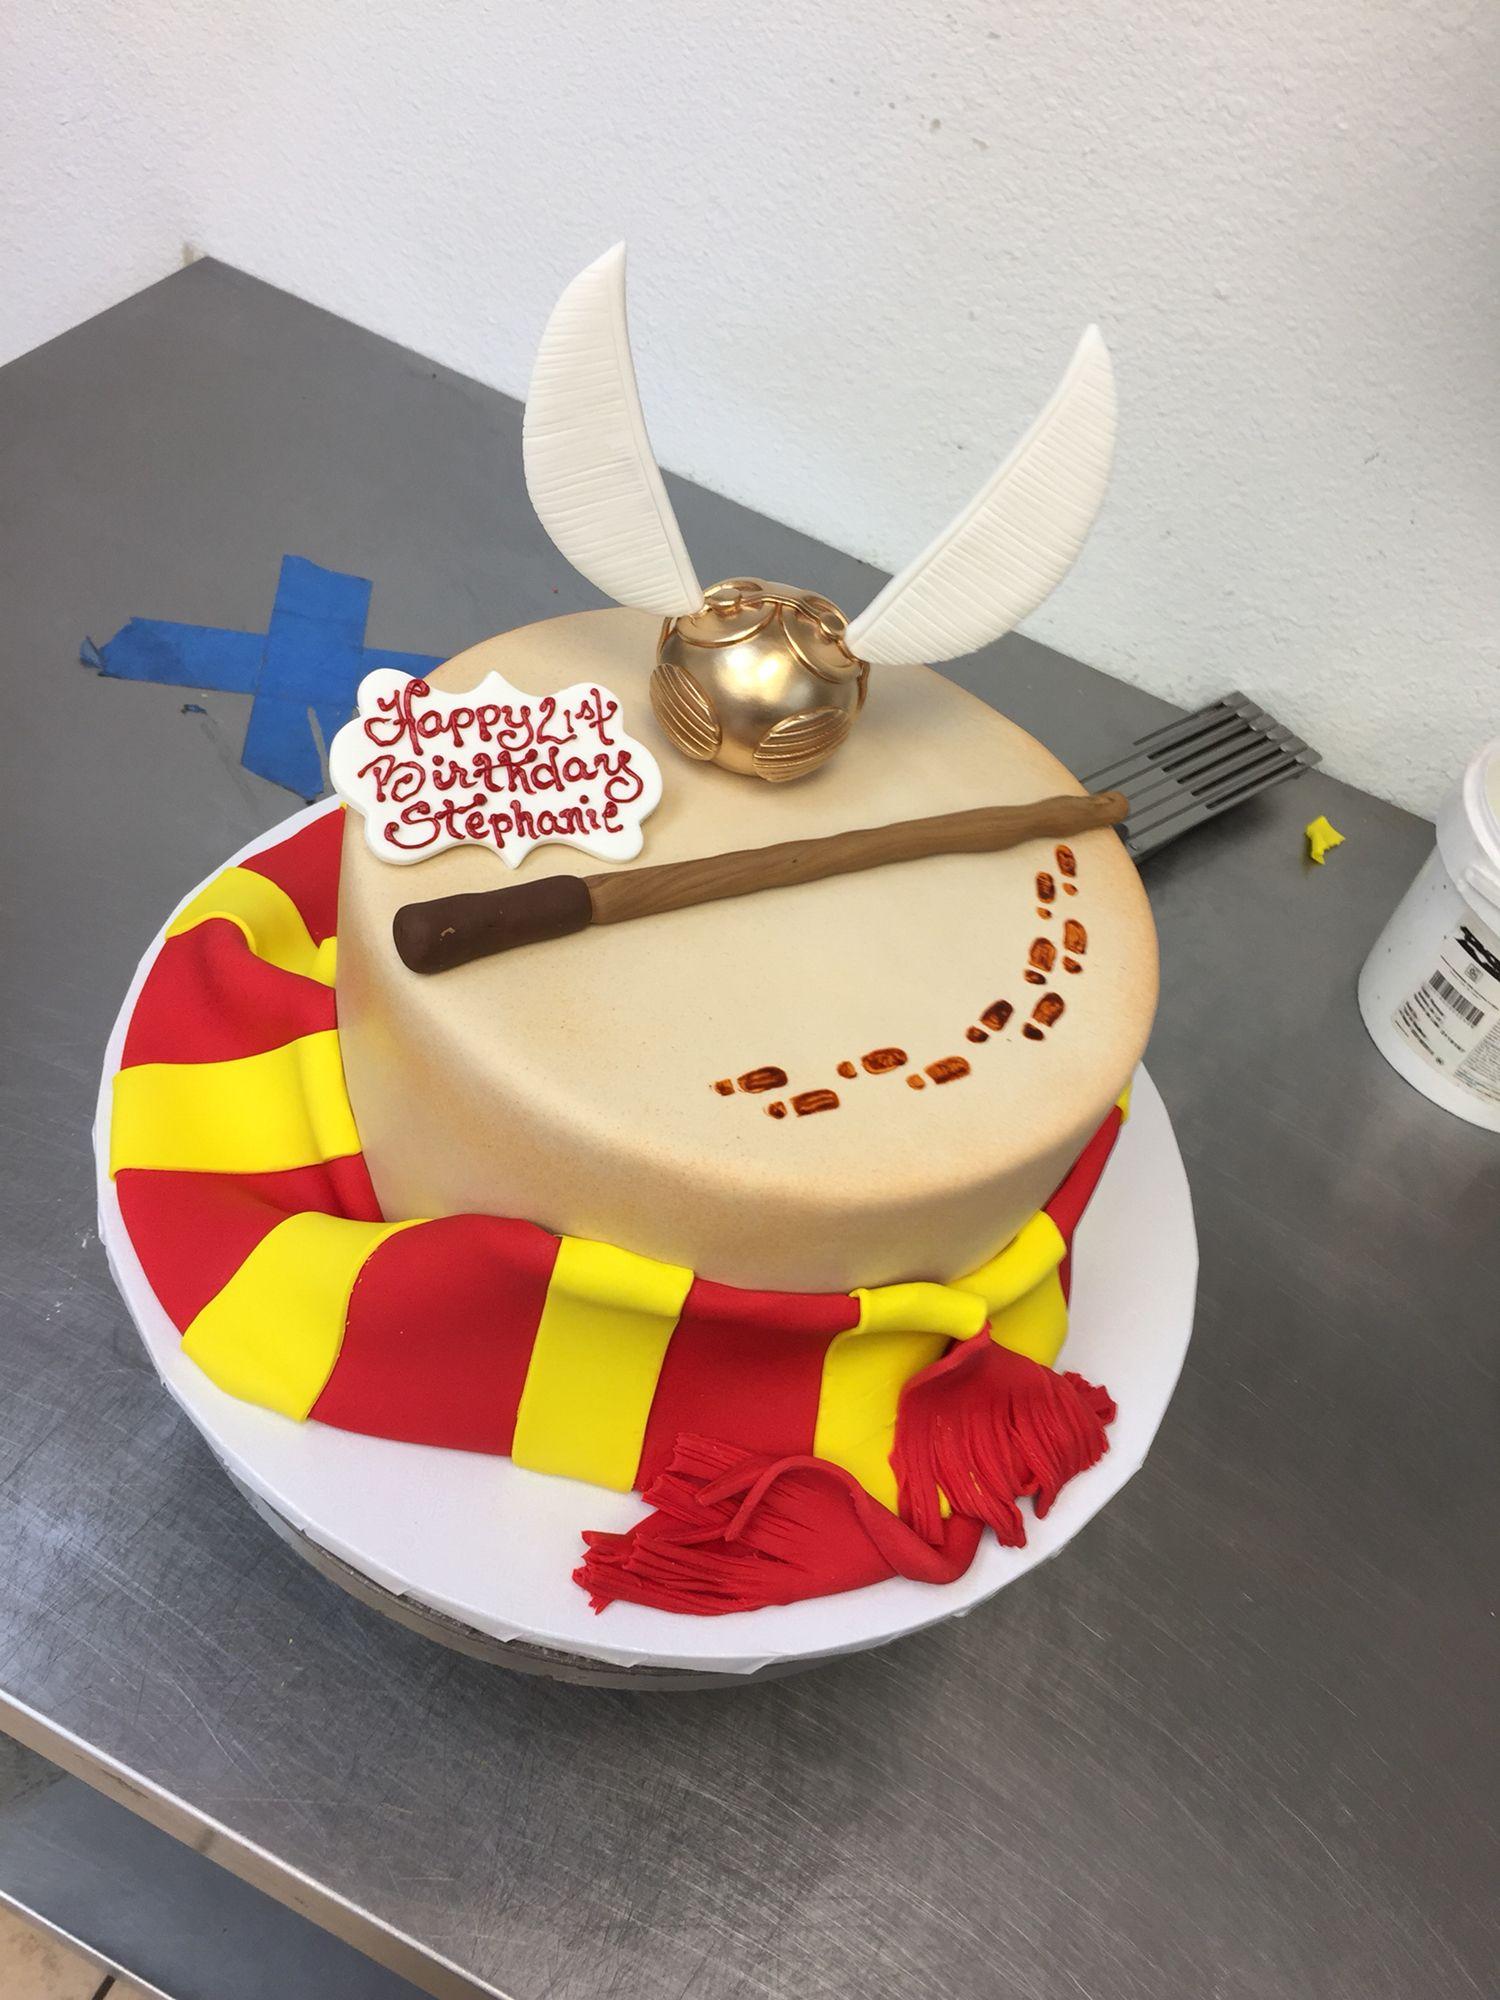 Harry Potter Cake With Handmade Fondant Golden Snitch